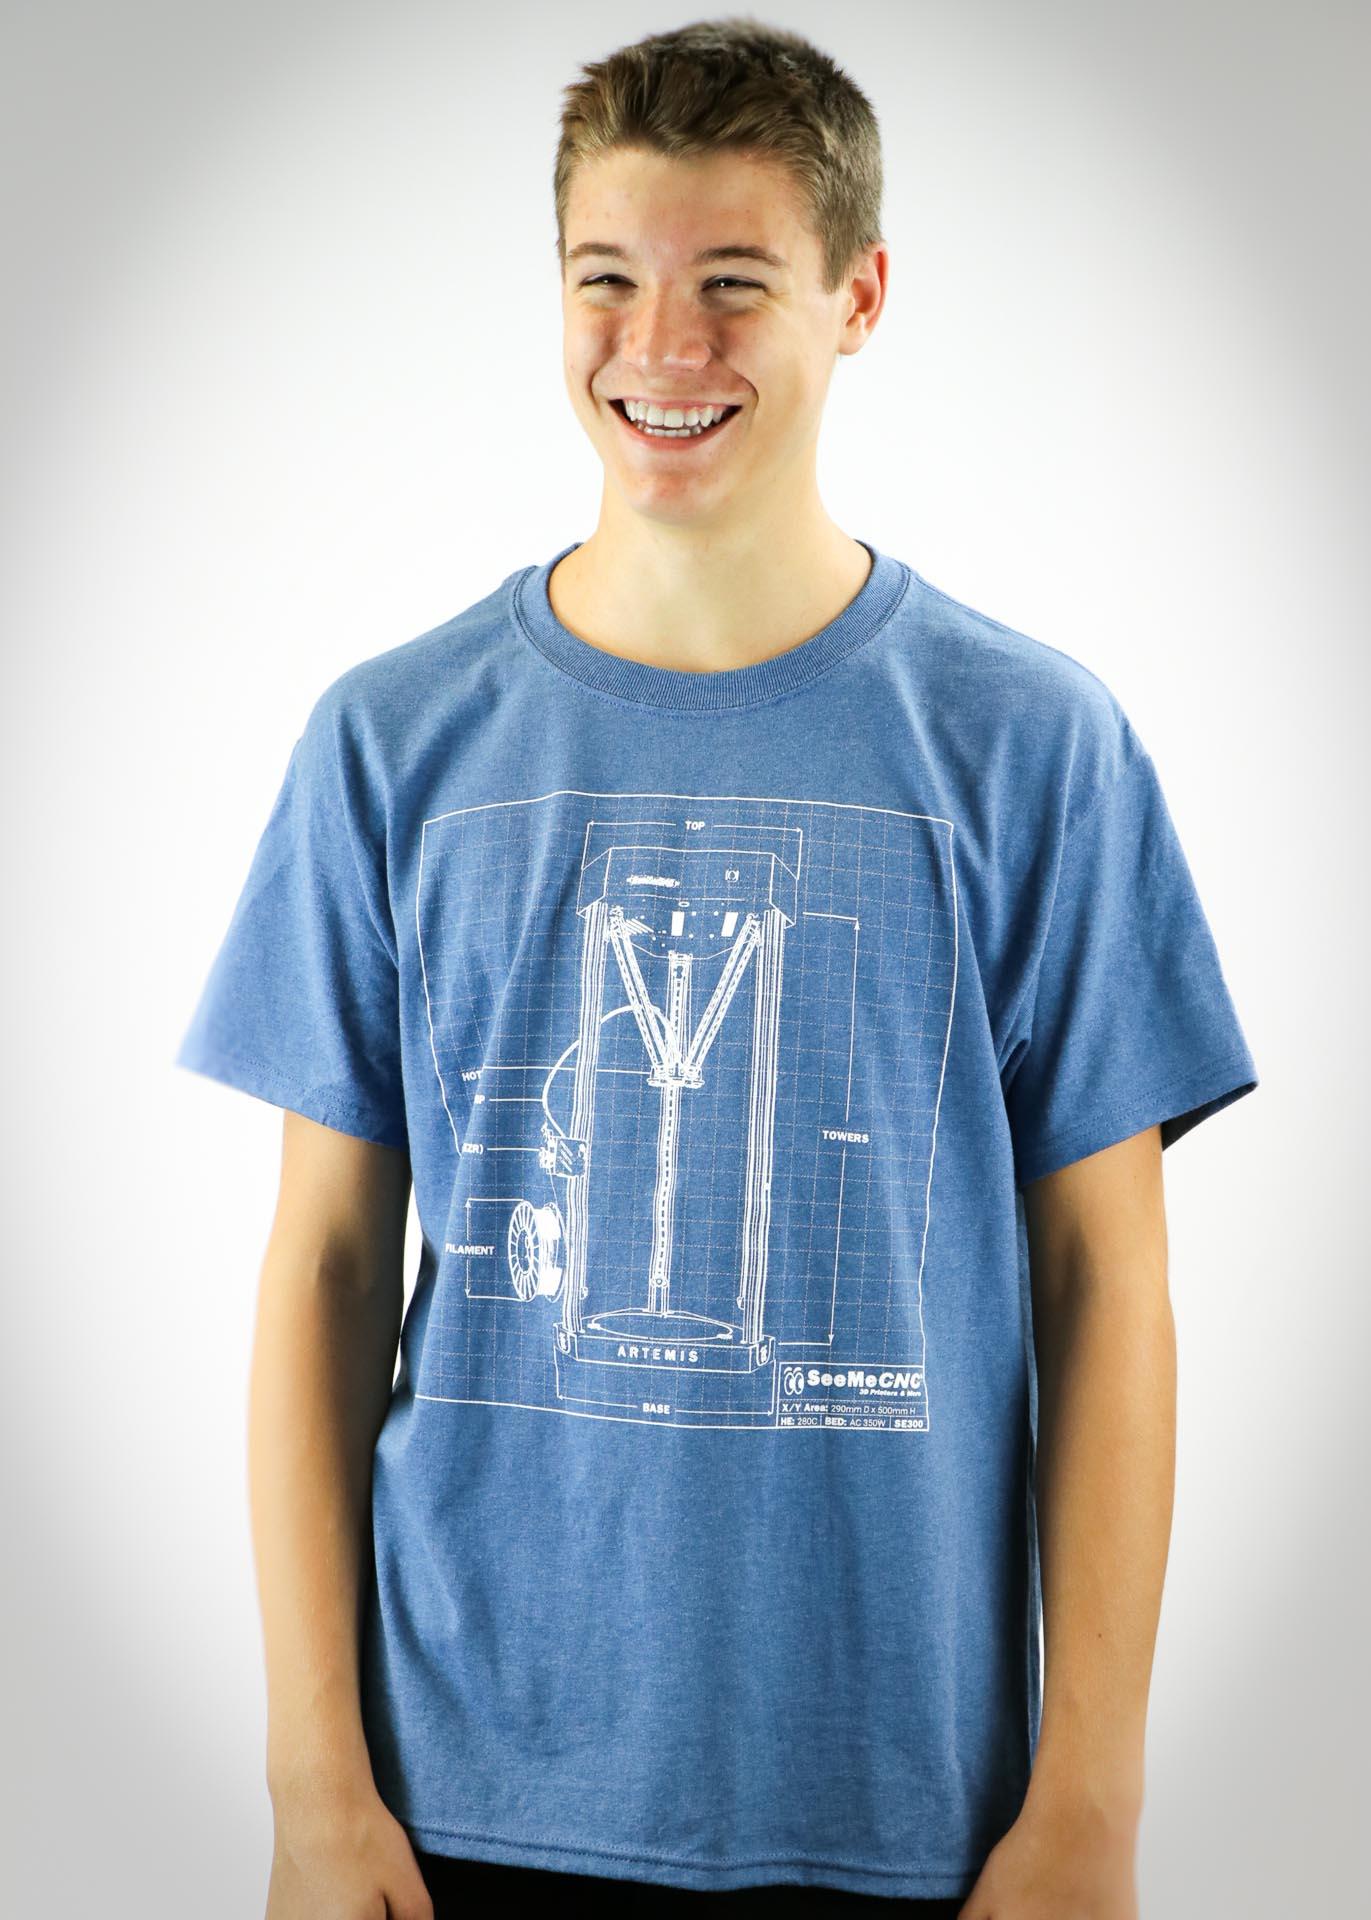 SeeMeCNC T Shirt Artemis Blueprint-1.jpg